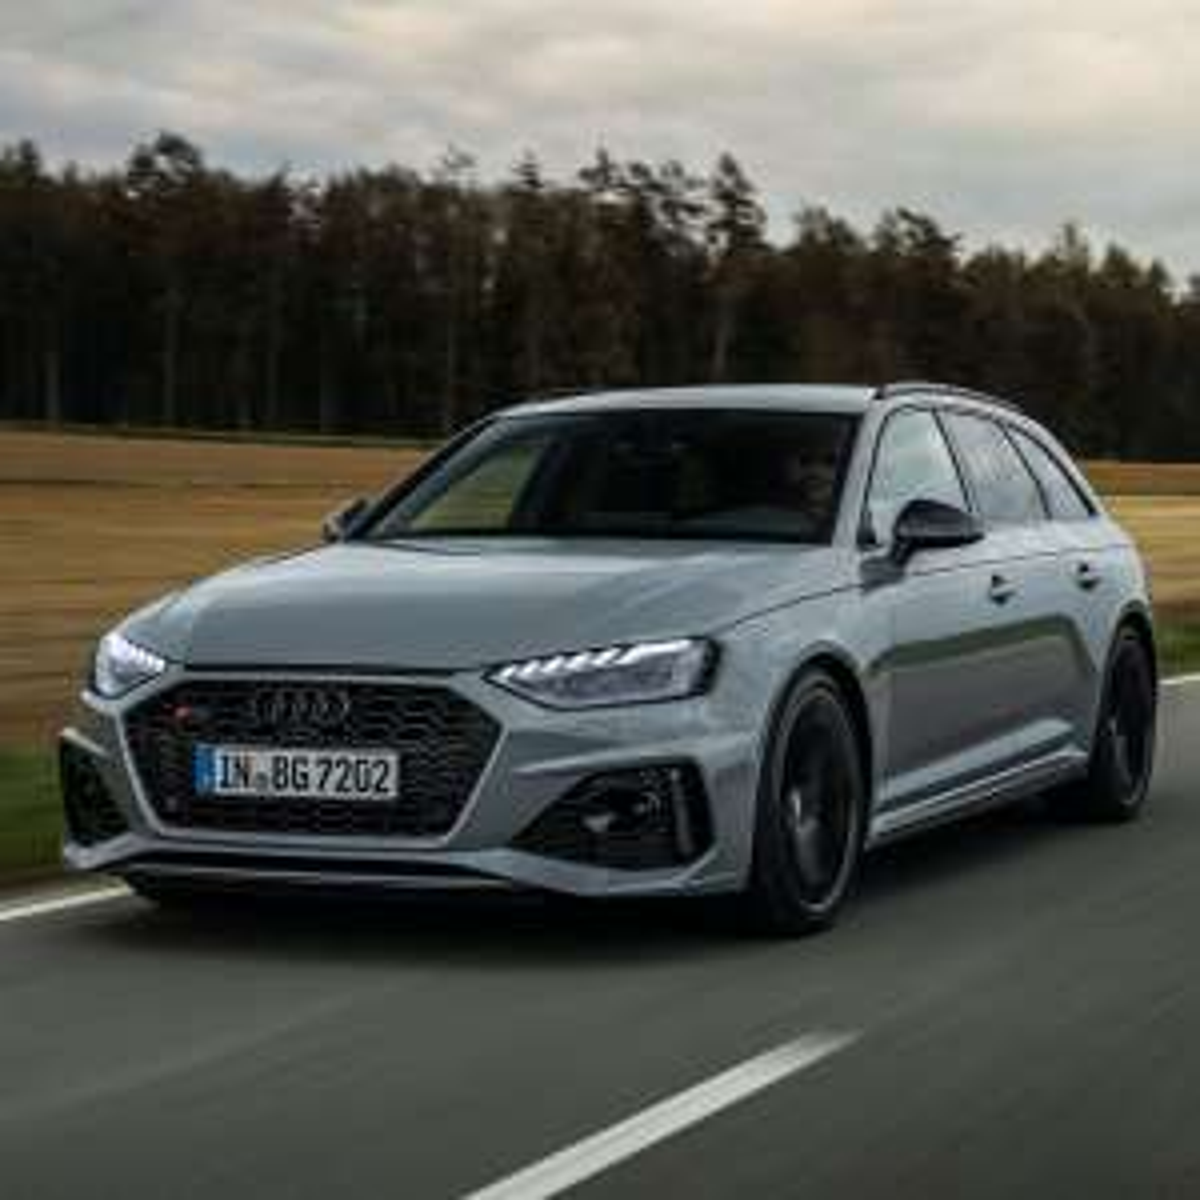 [Gewerbeleasing] Audi RS4 Avant (450 PS) mtl. 499€ + 755€ ÜF (eff. mtl. 515€), LF 0,72, GF 0,74, 48 Monate